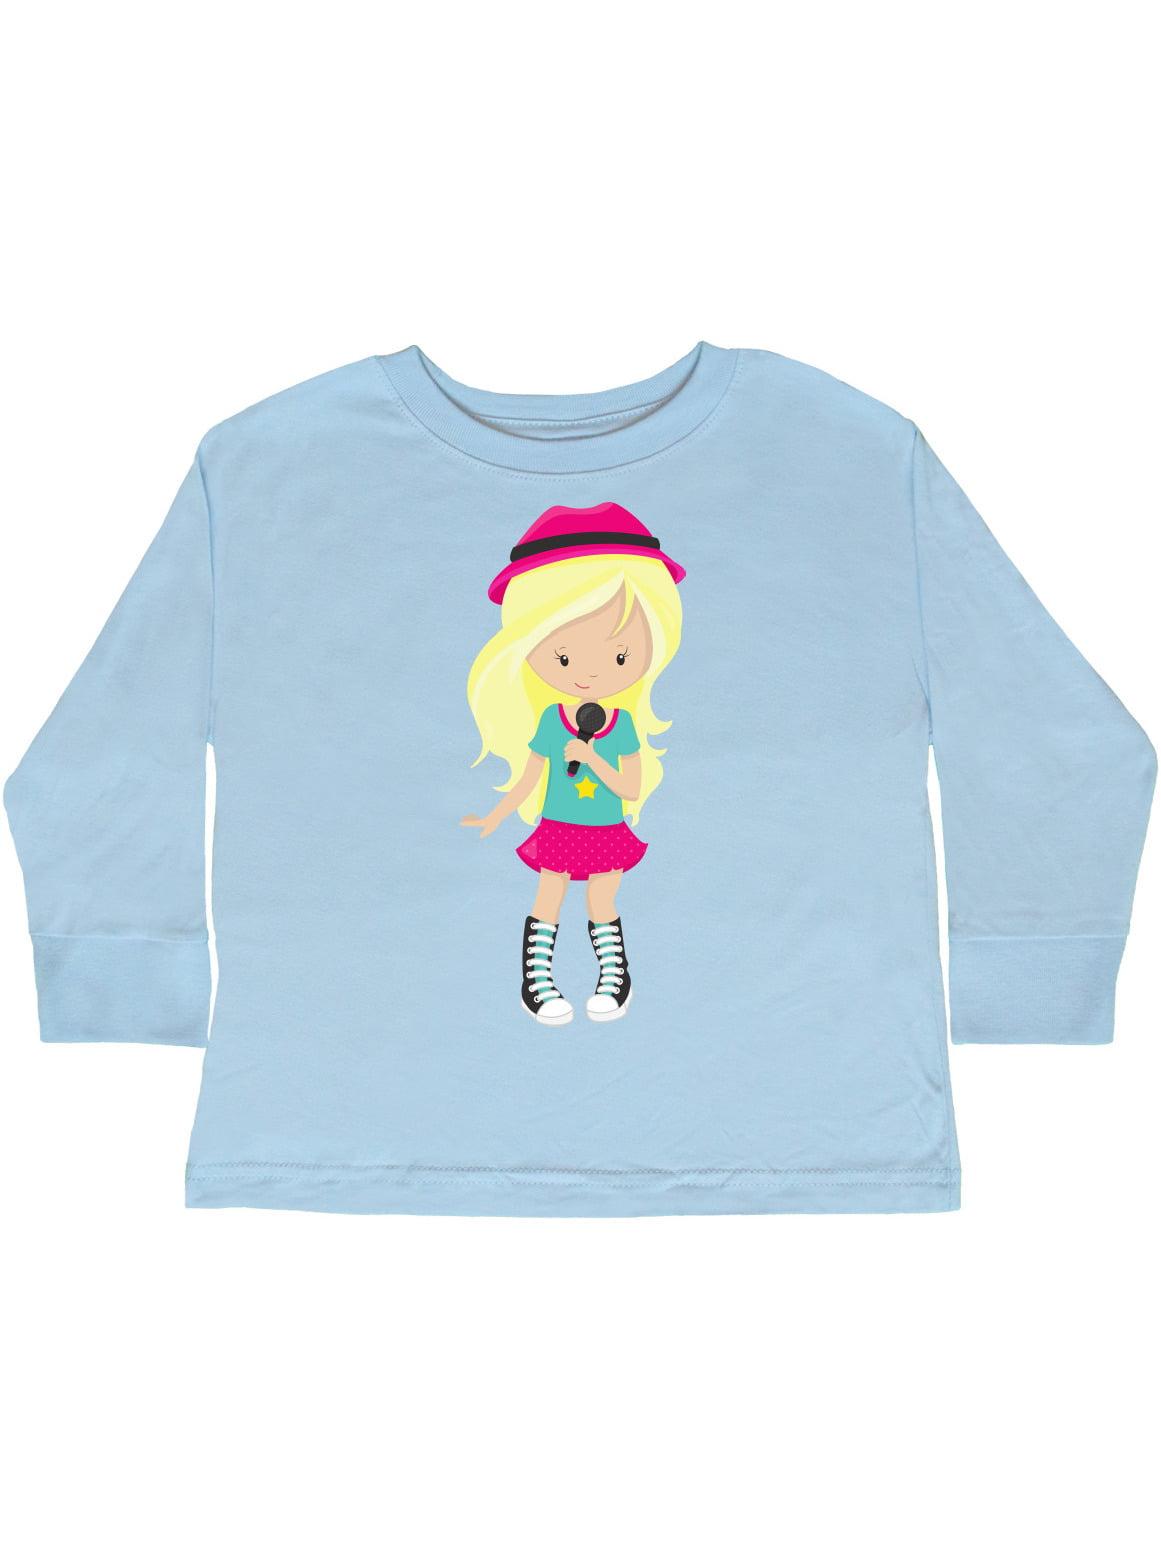 Band Singer Toddler T-Shirt Rock Girl inktastic African American Girl